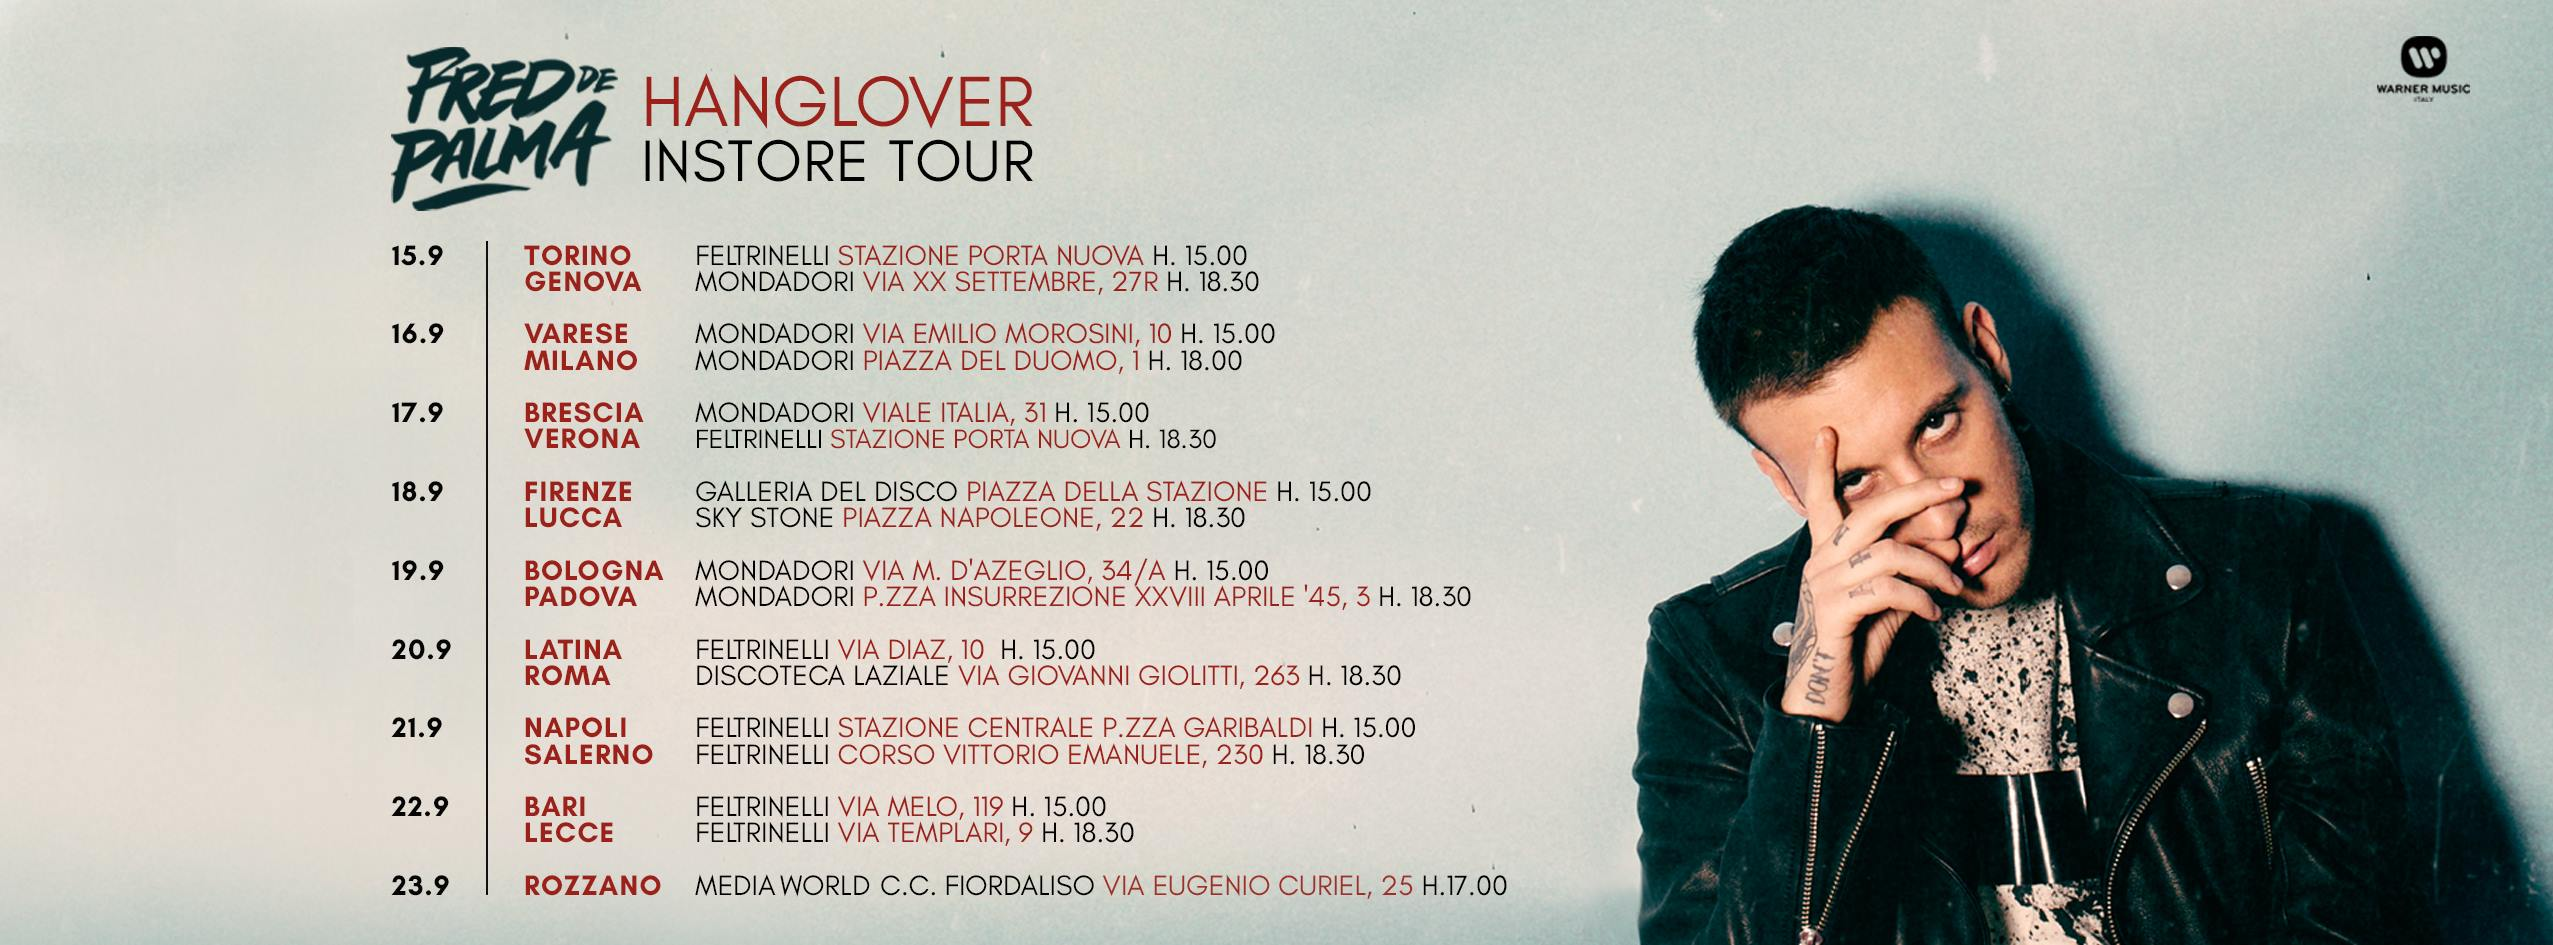 Instore Tour Hanglover Fred De Palma